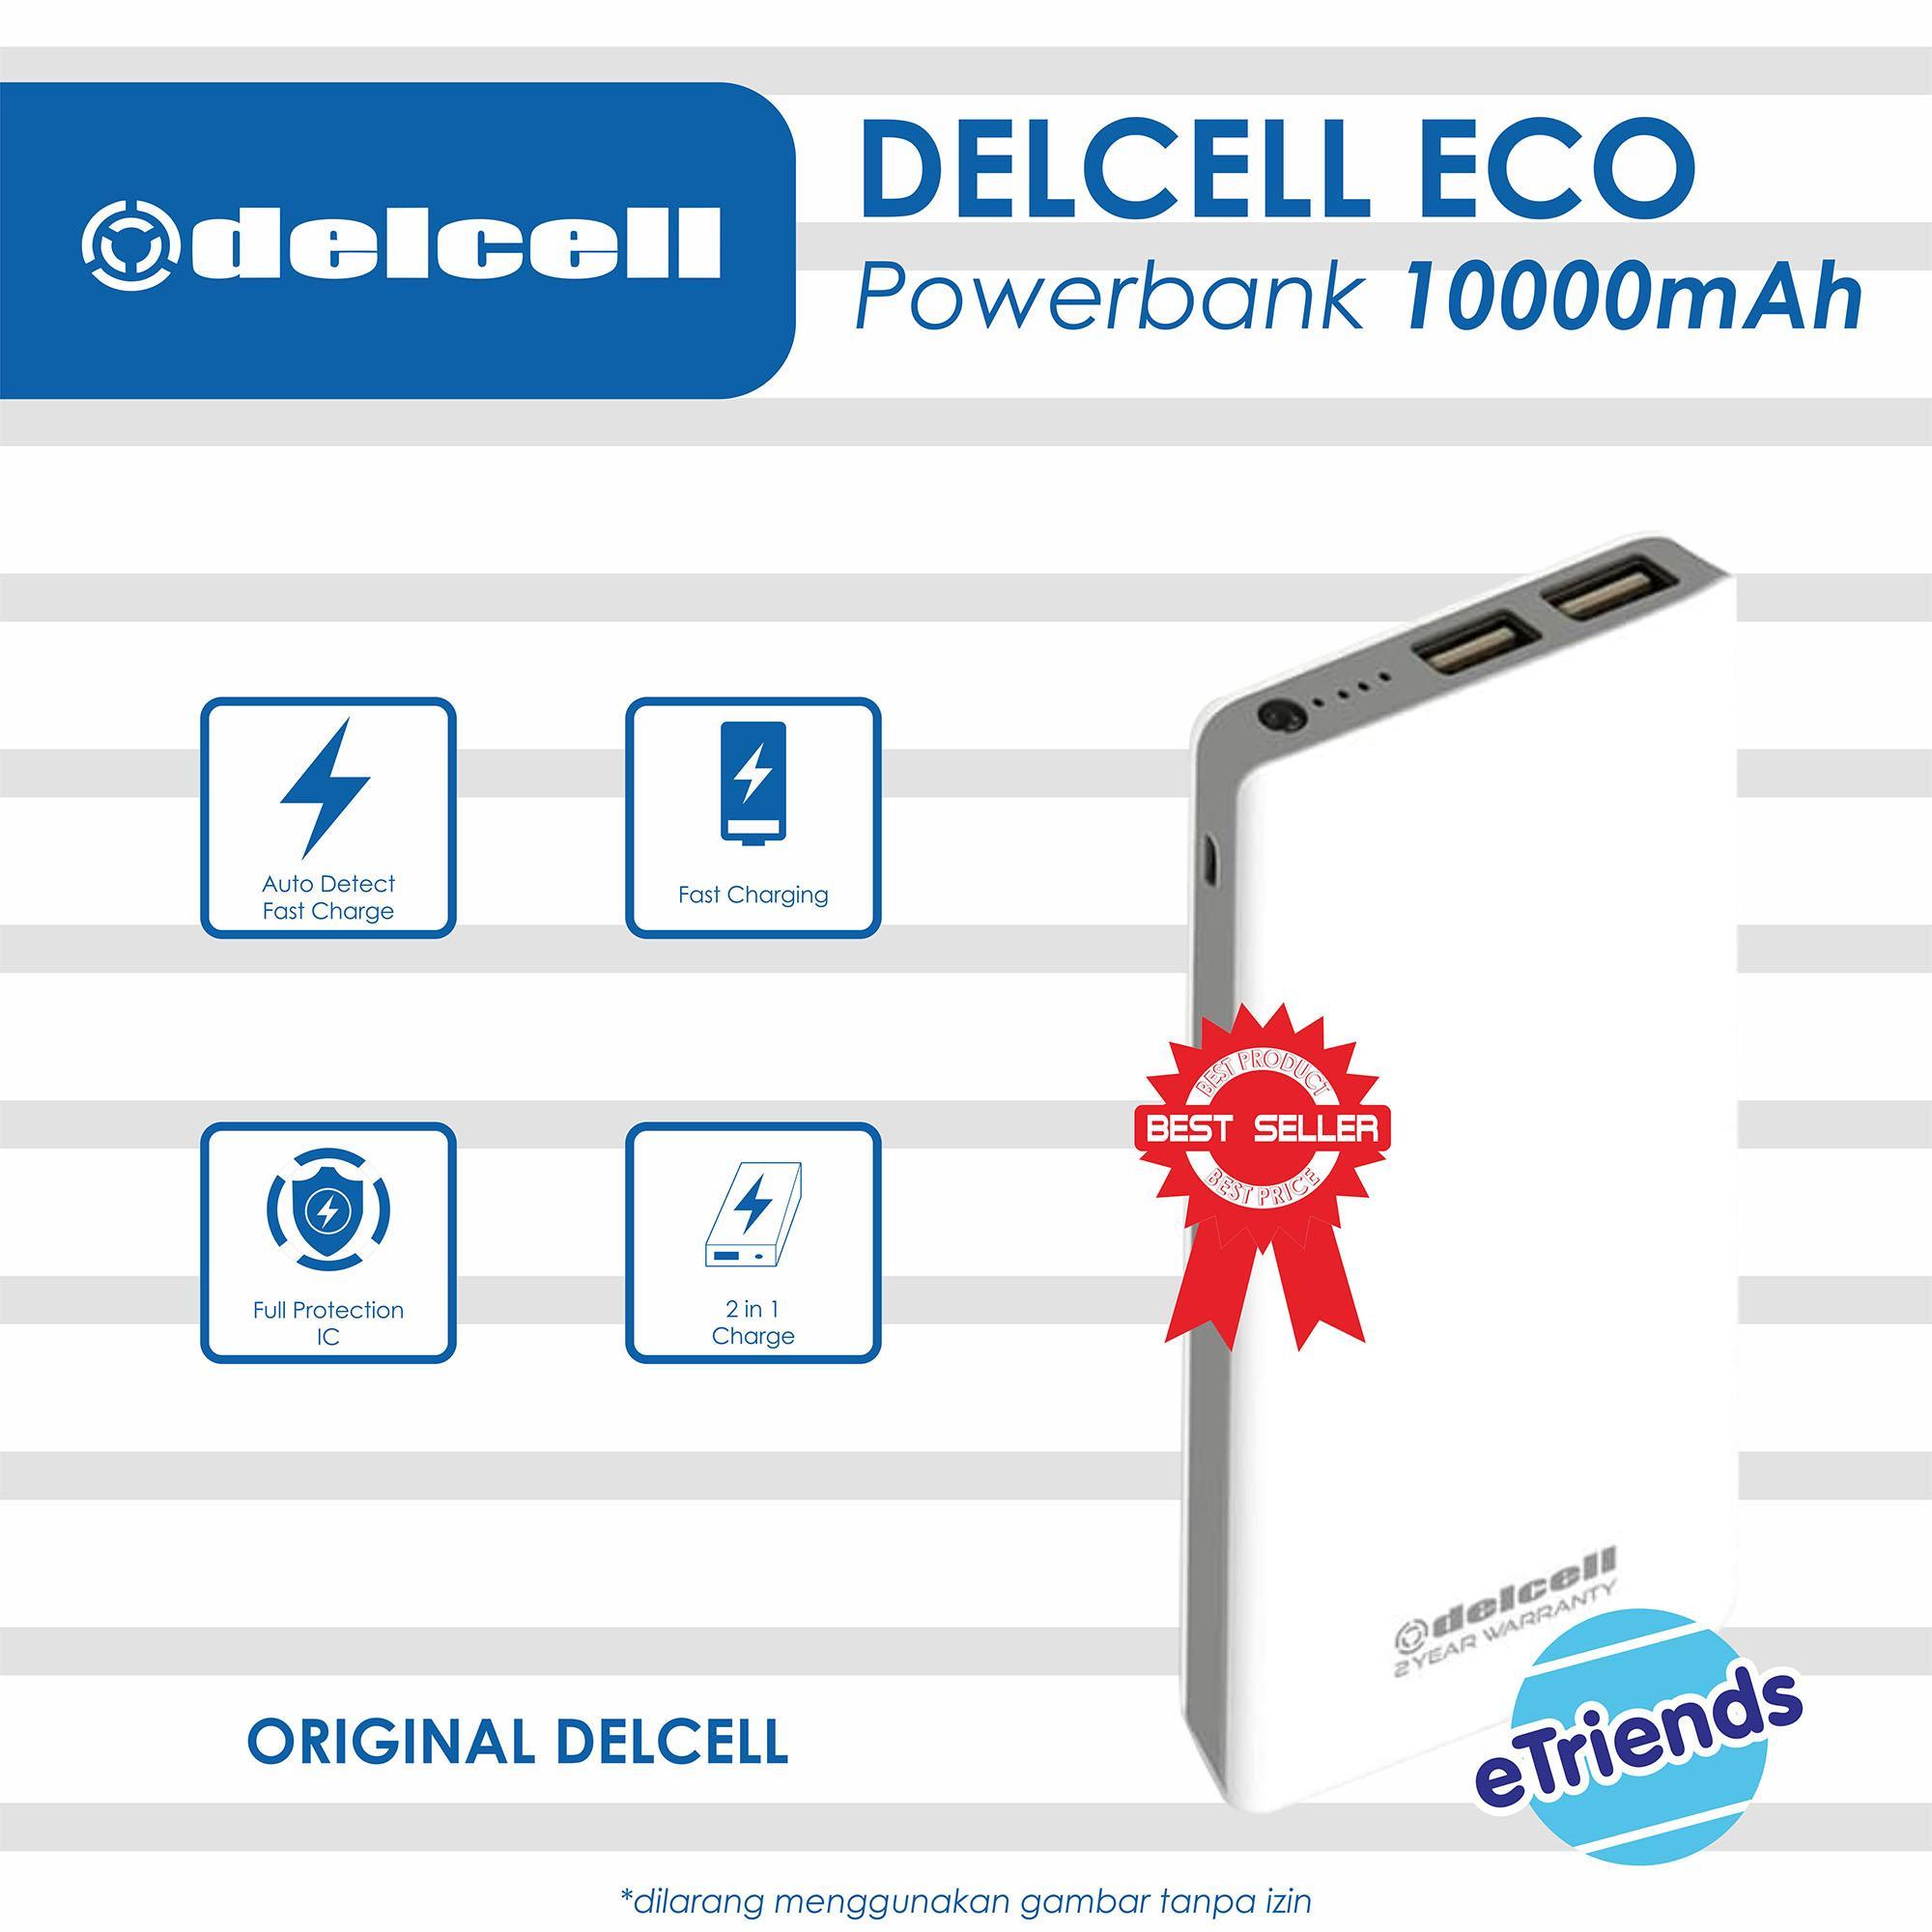 PowerBank Delcell ECO 10000Mah Power Bank Original Fast Charging